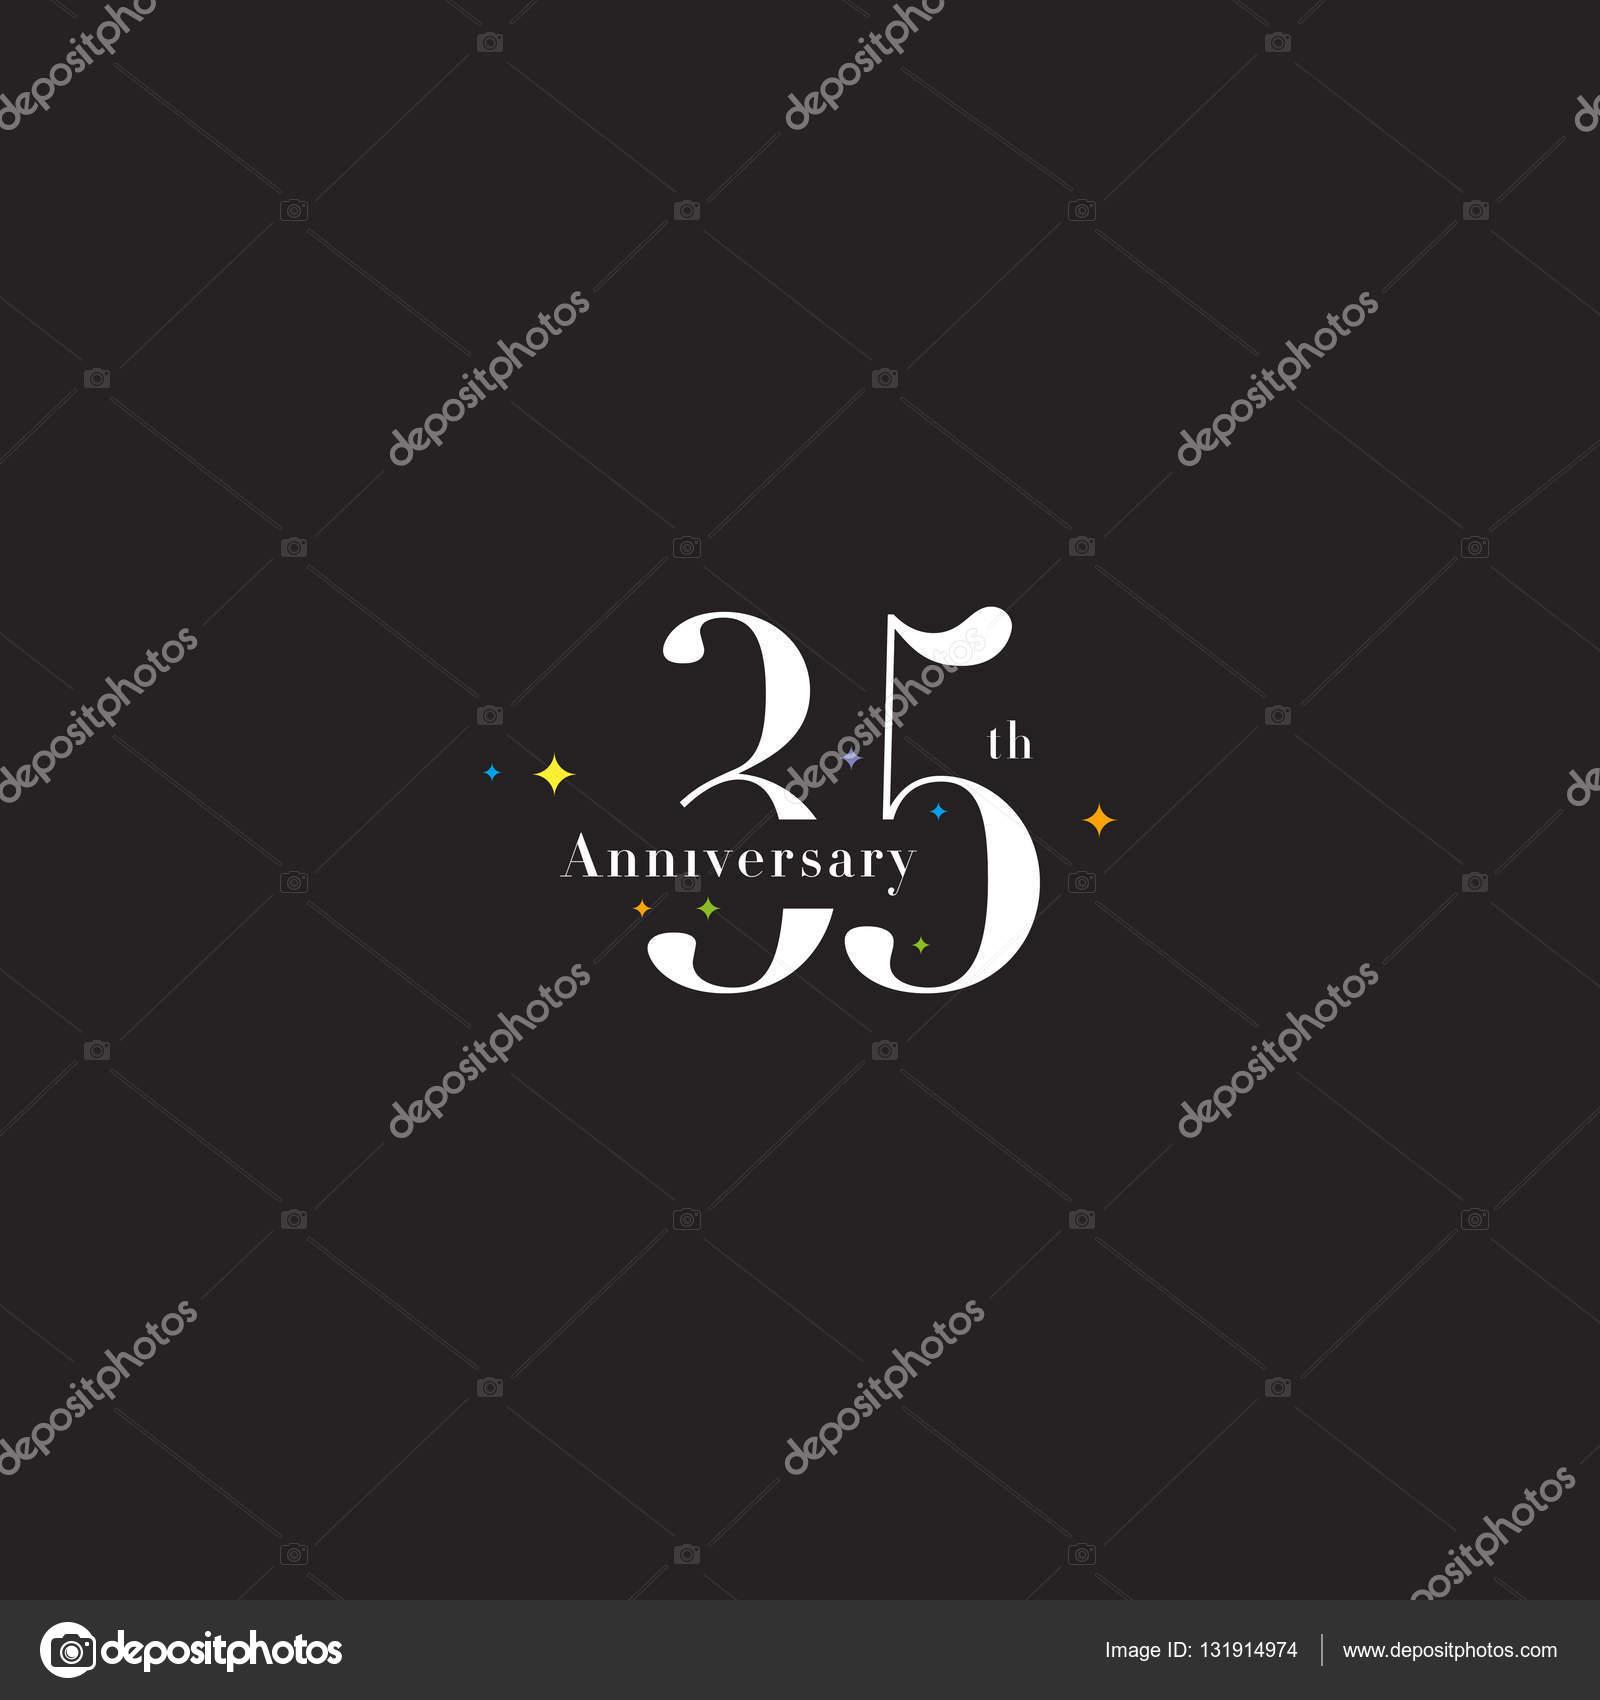 35e Verjaardag Logo Pictogram Stockvector C Brainbistro 131914974